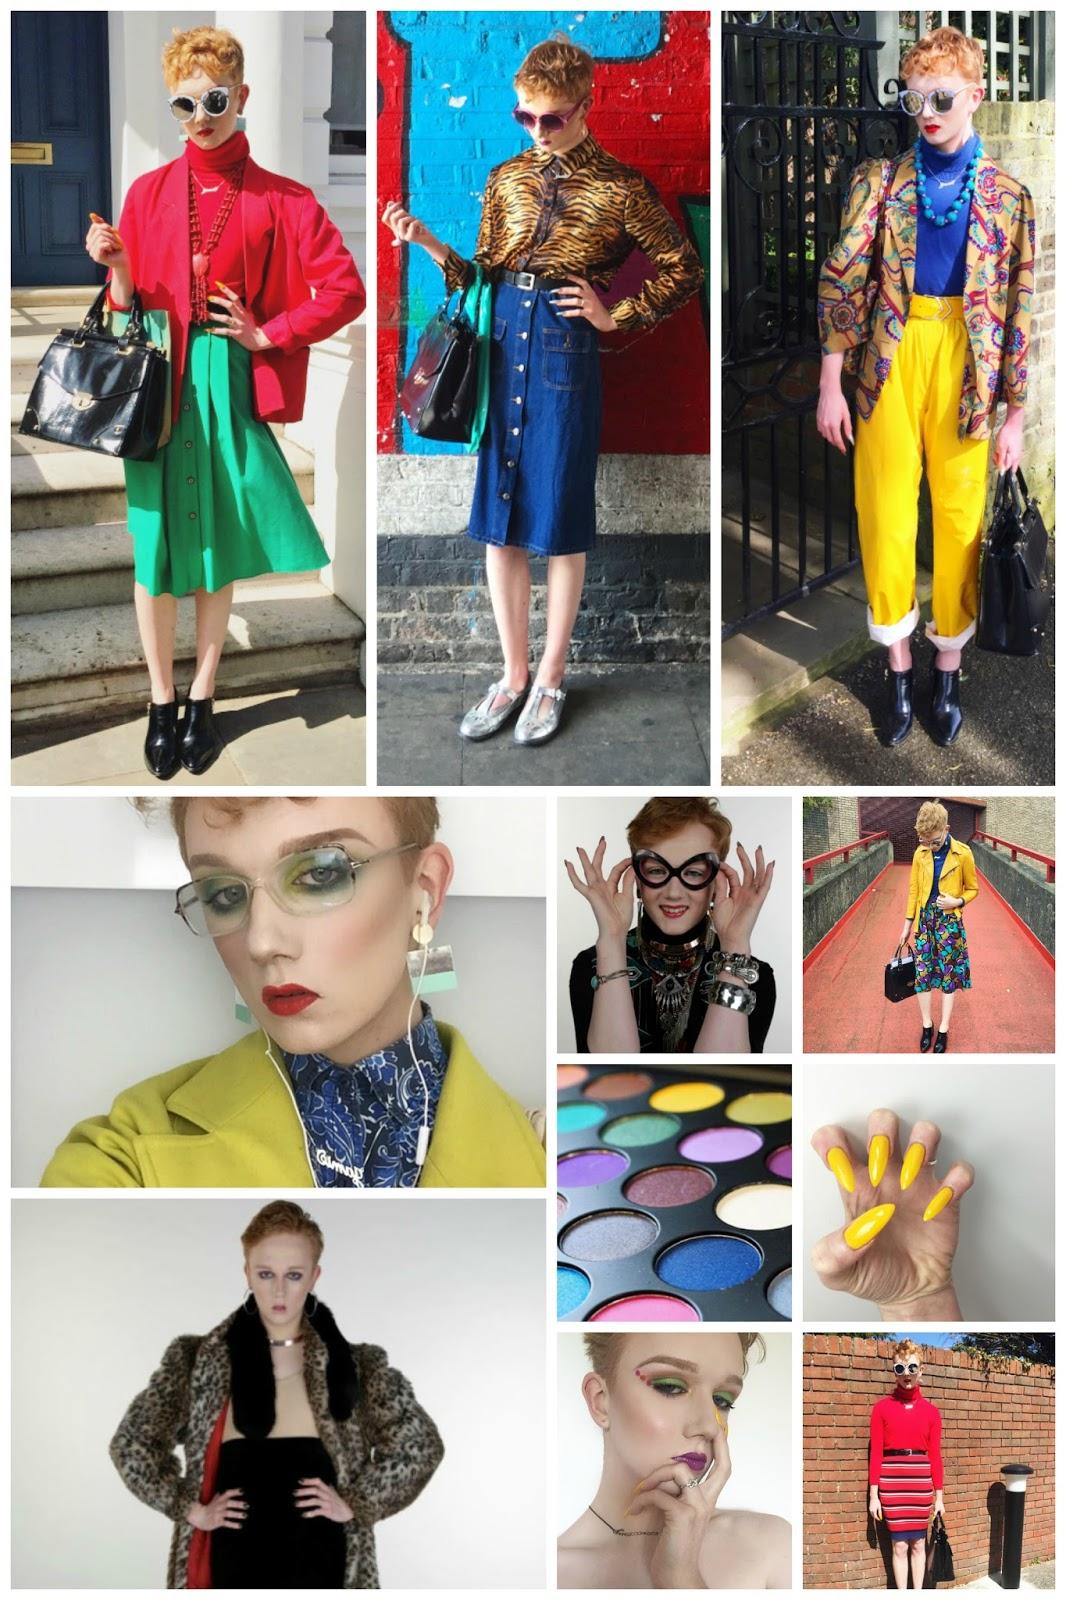 blog crush, blogger crush, favourite blogger, style blogger, uk blogger, Leopard Print elephant, fashion student, colourful 80s style